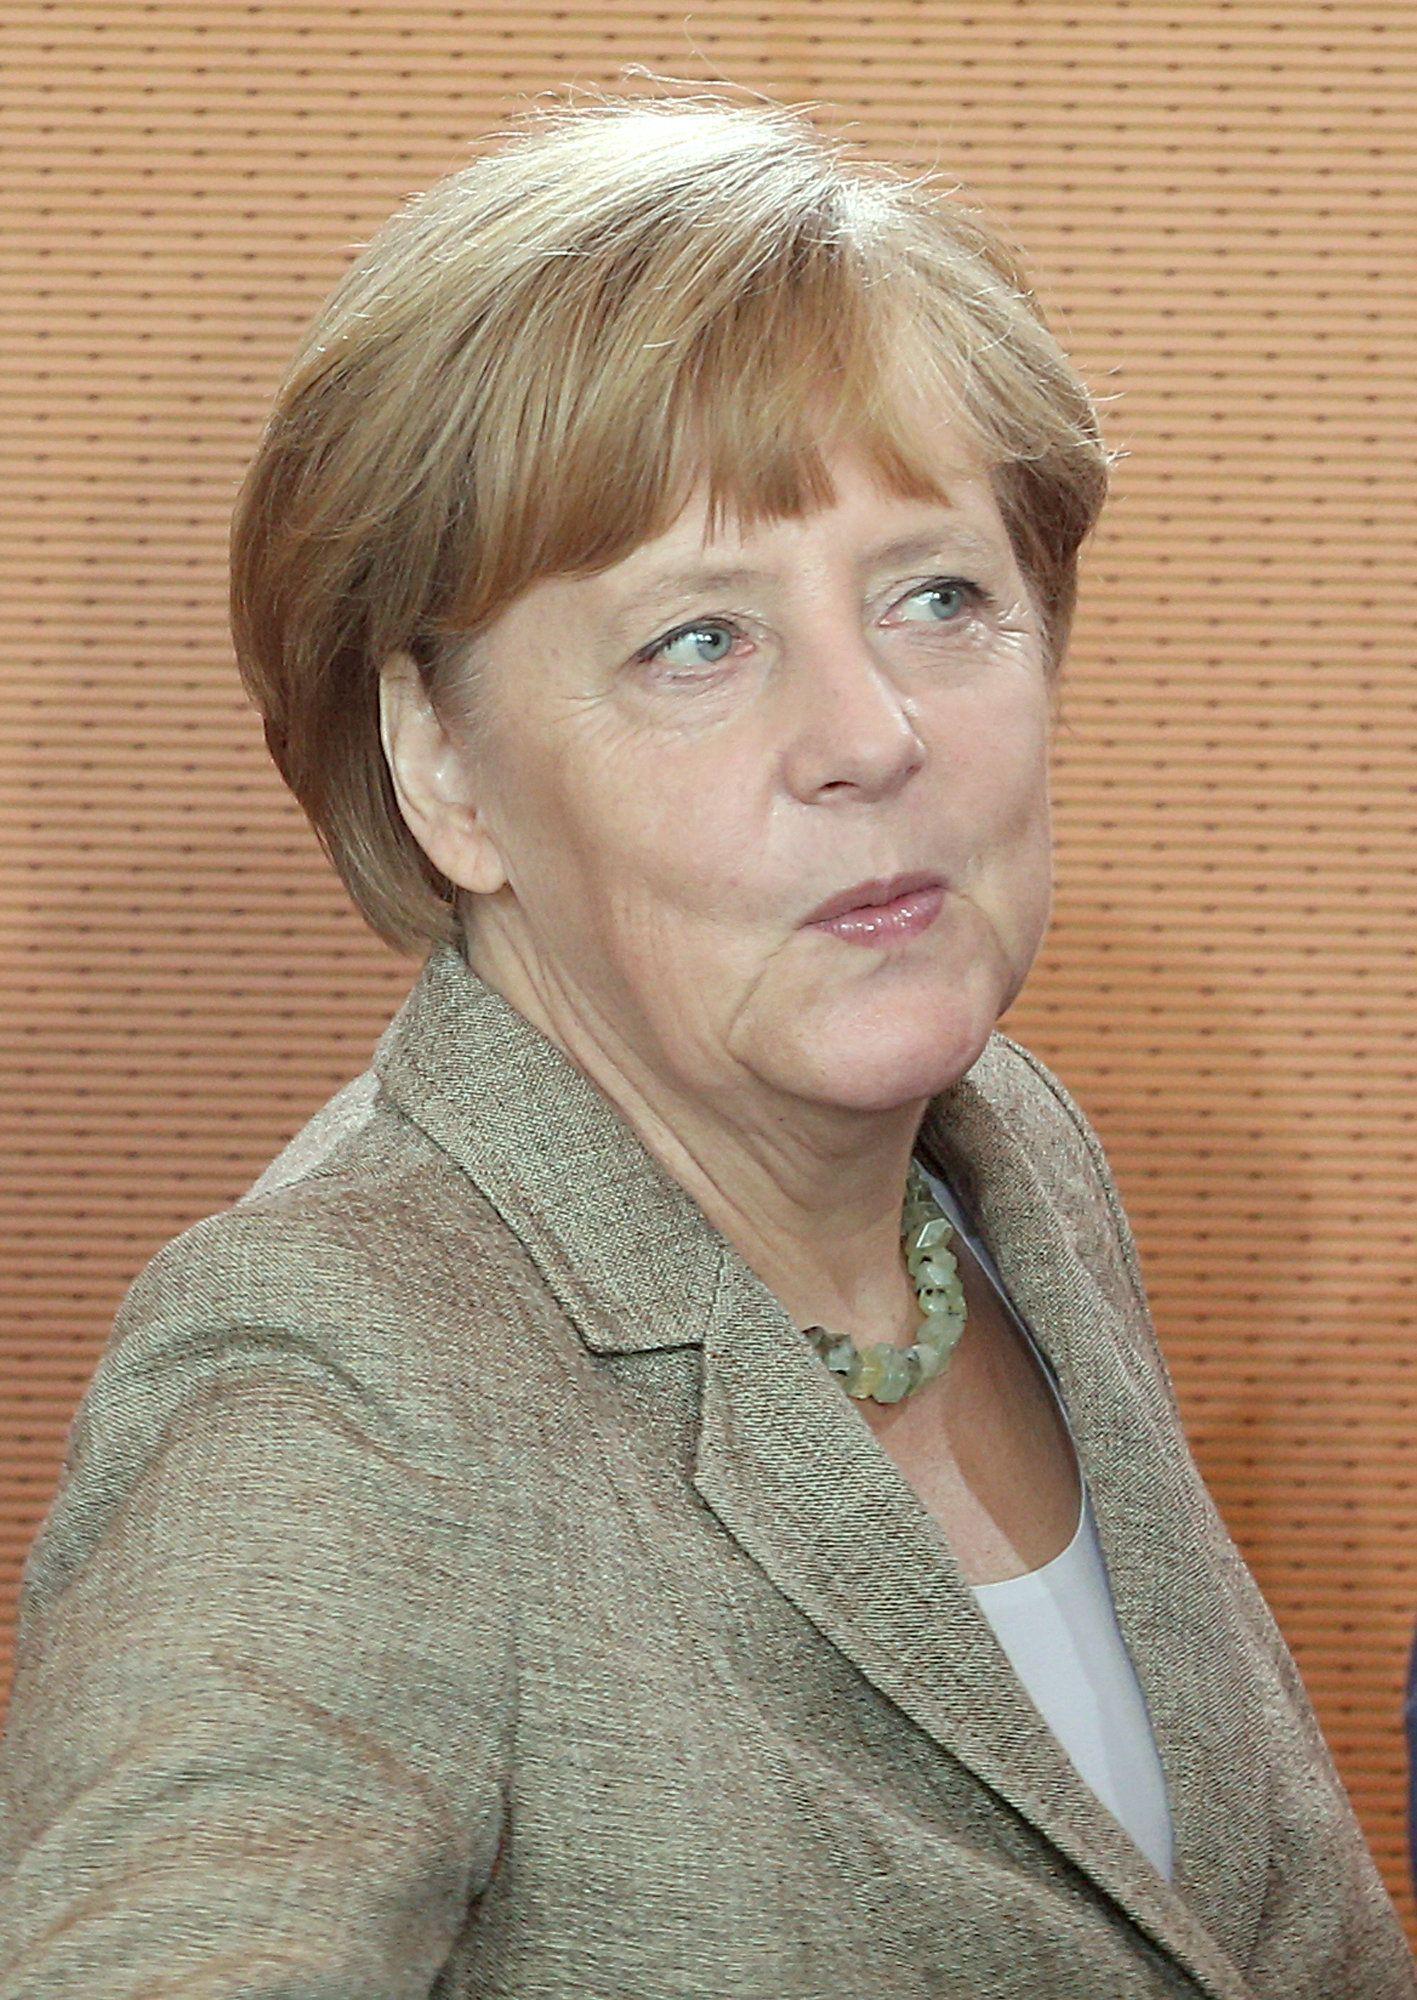 Angela Merkel / Kabinettssitzung